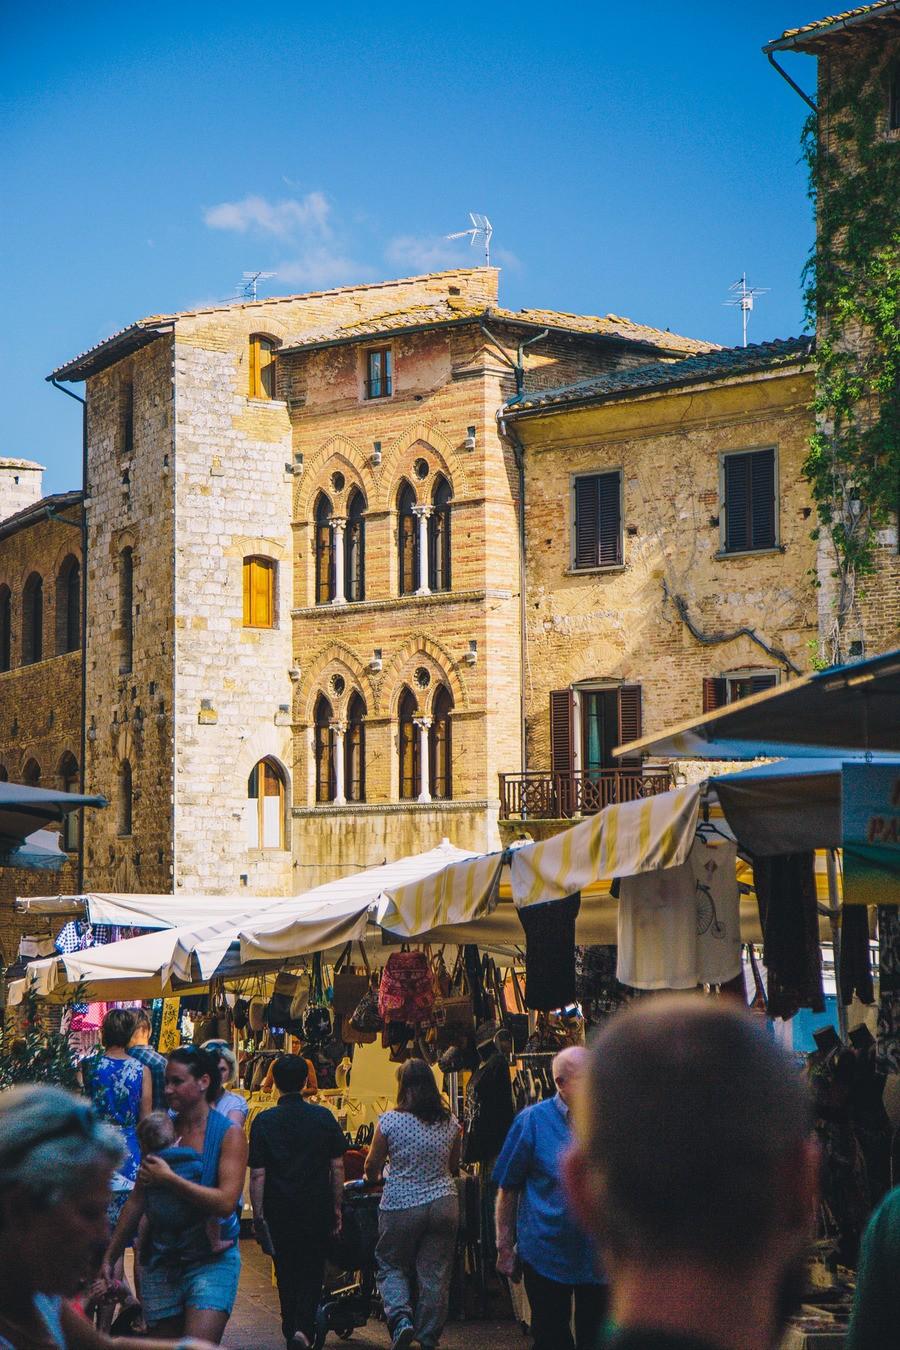 Le marché de San Gimignano